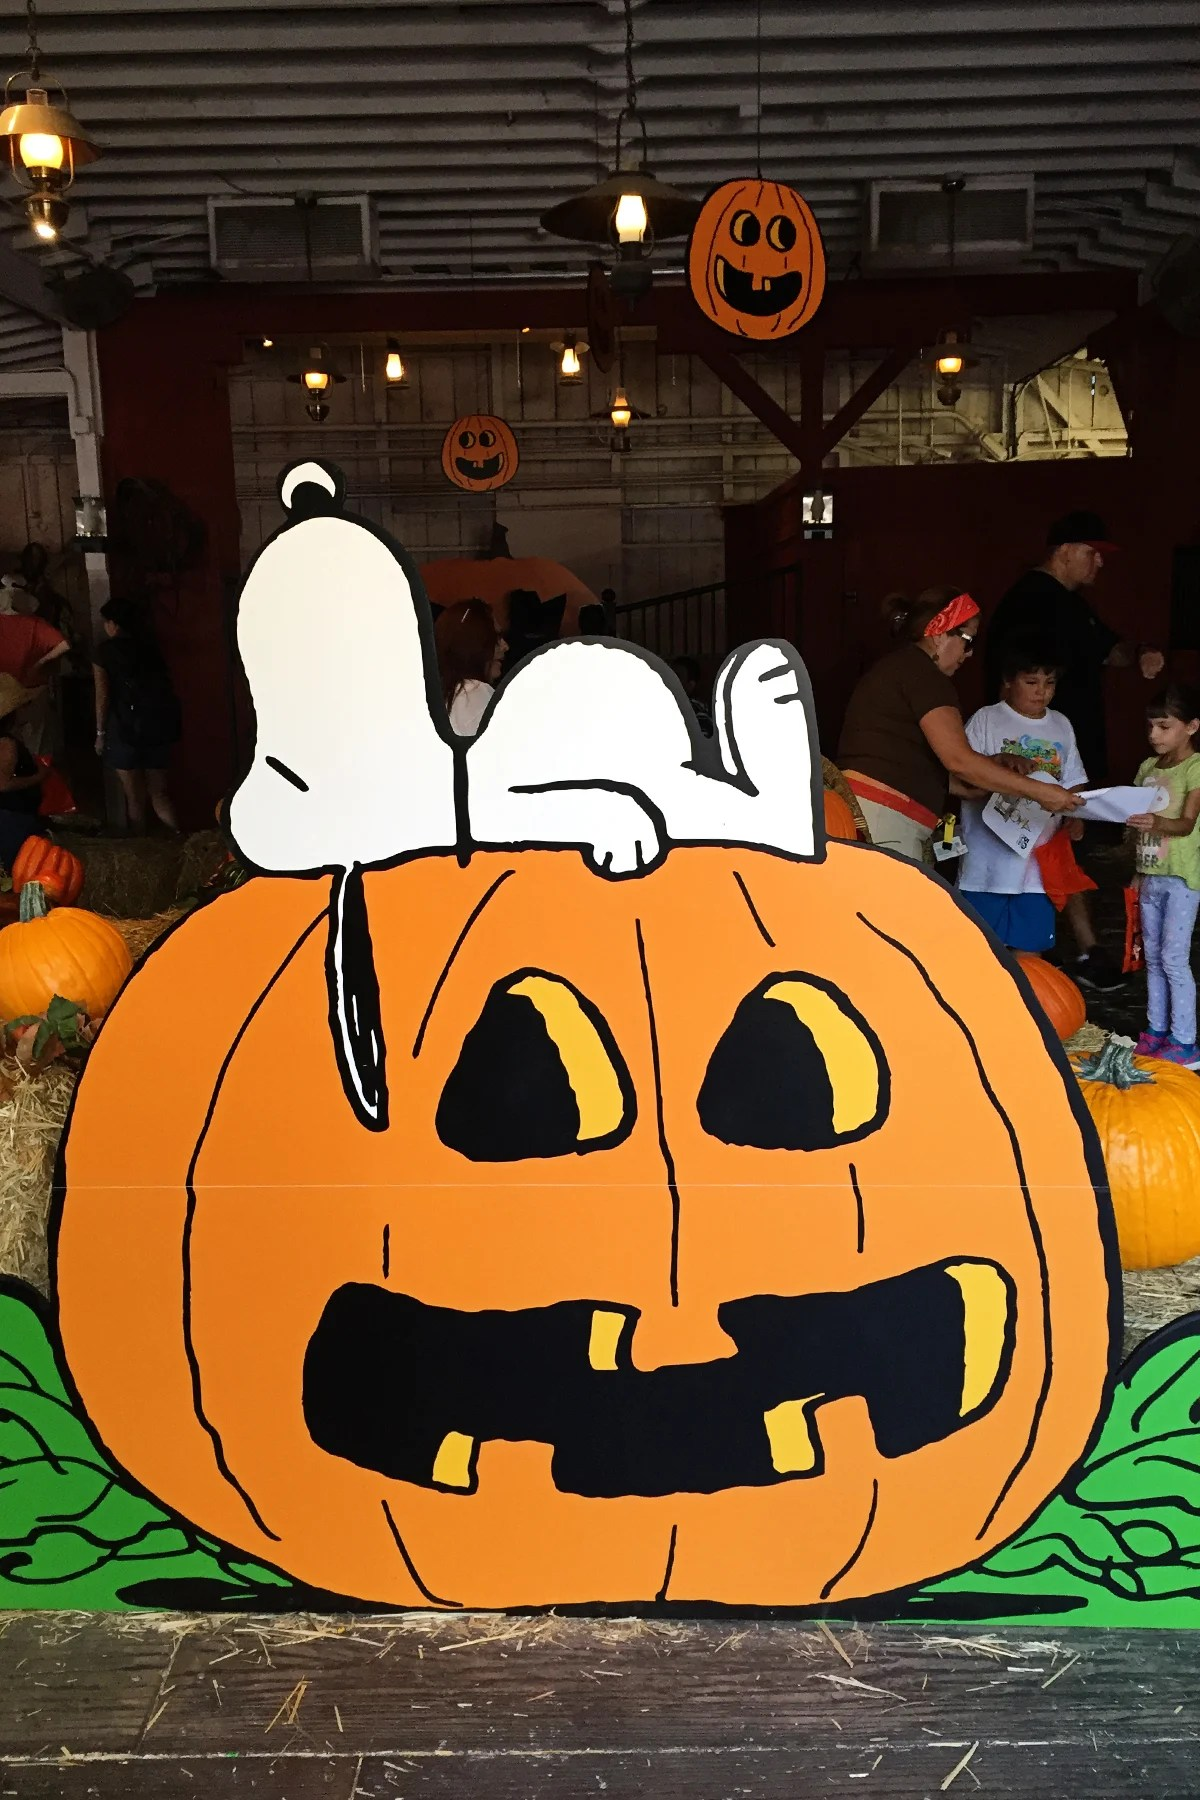 Family Fun for Halloween at Knott's Spooky Farm